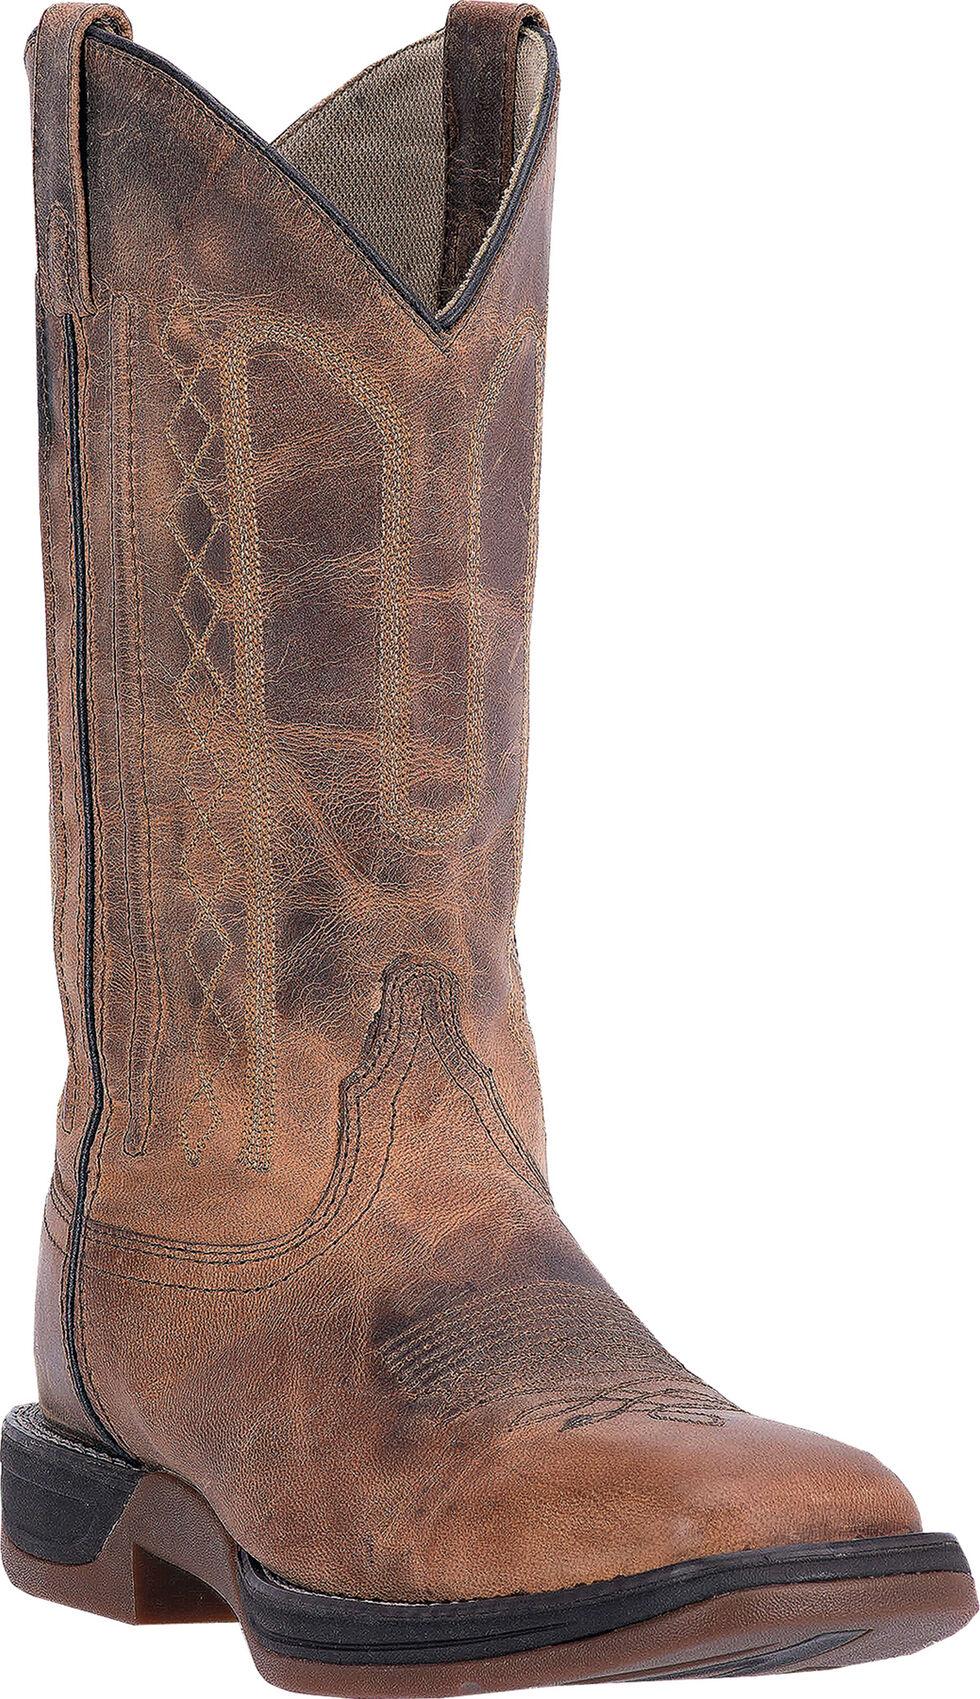 Laredo Tan Bennett Cowboy Boots - Square Toe, Tan, hi-res